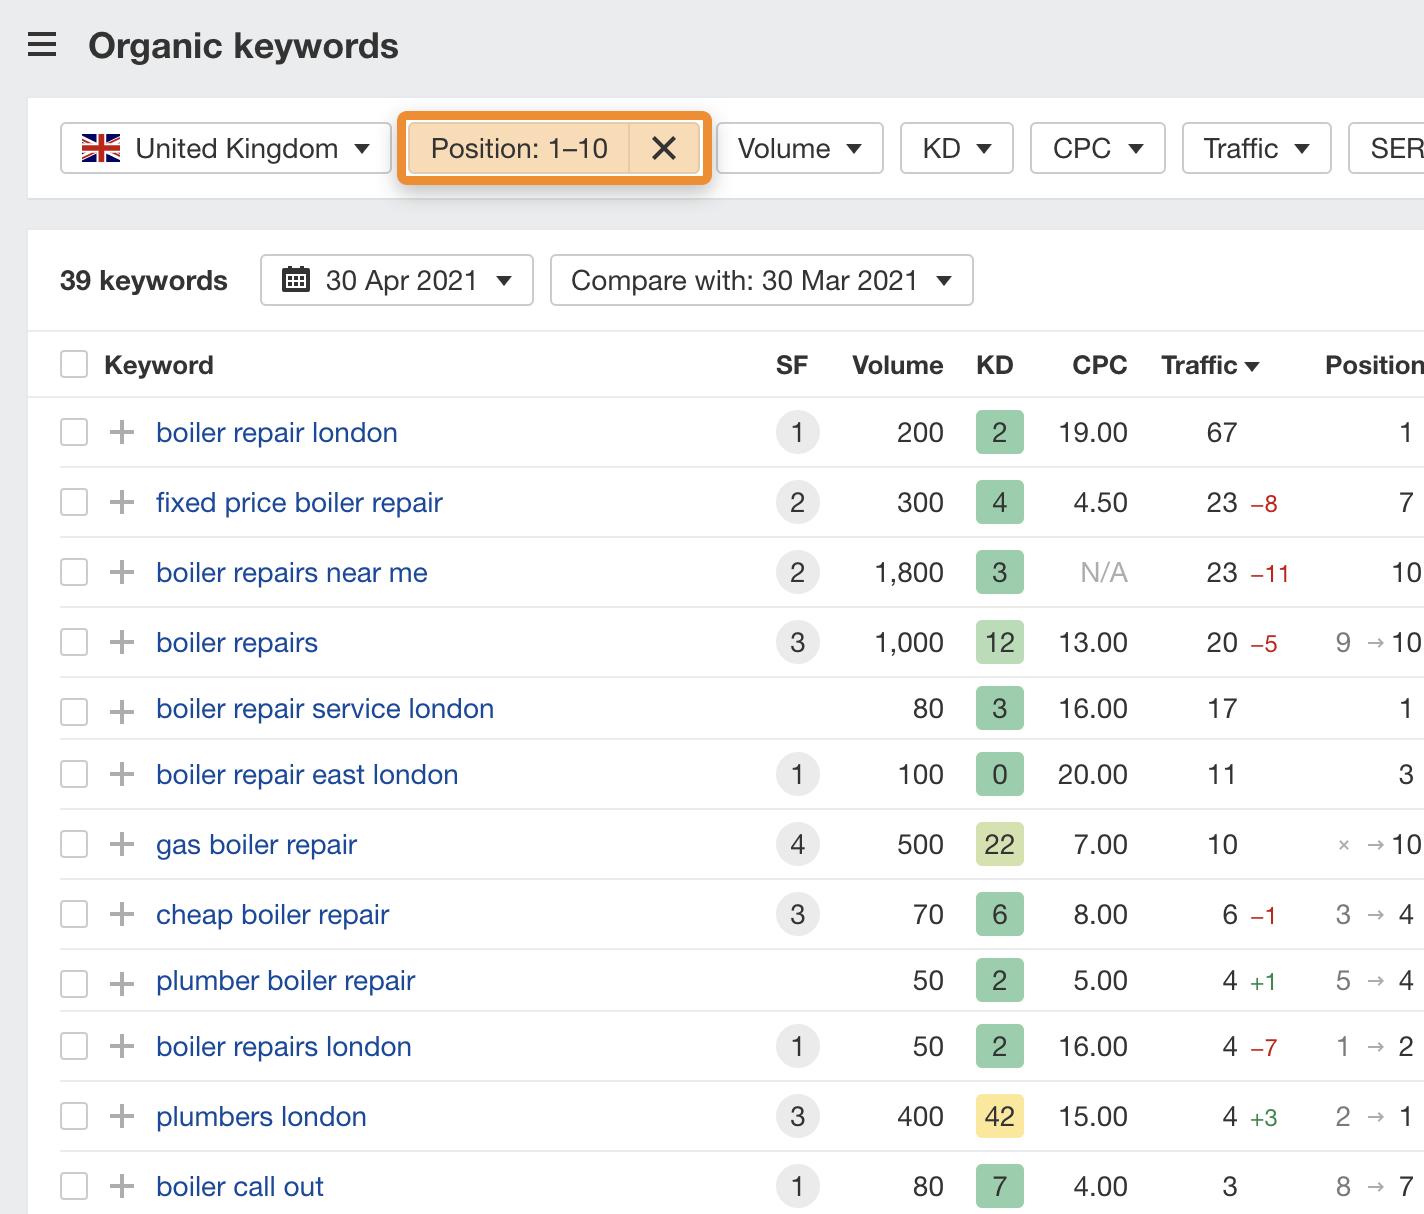 12 organic keywords